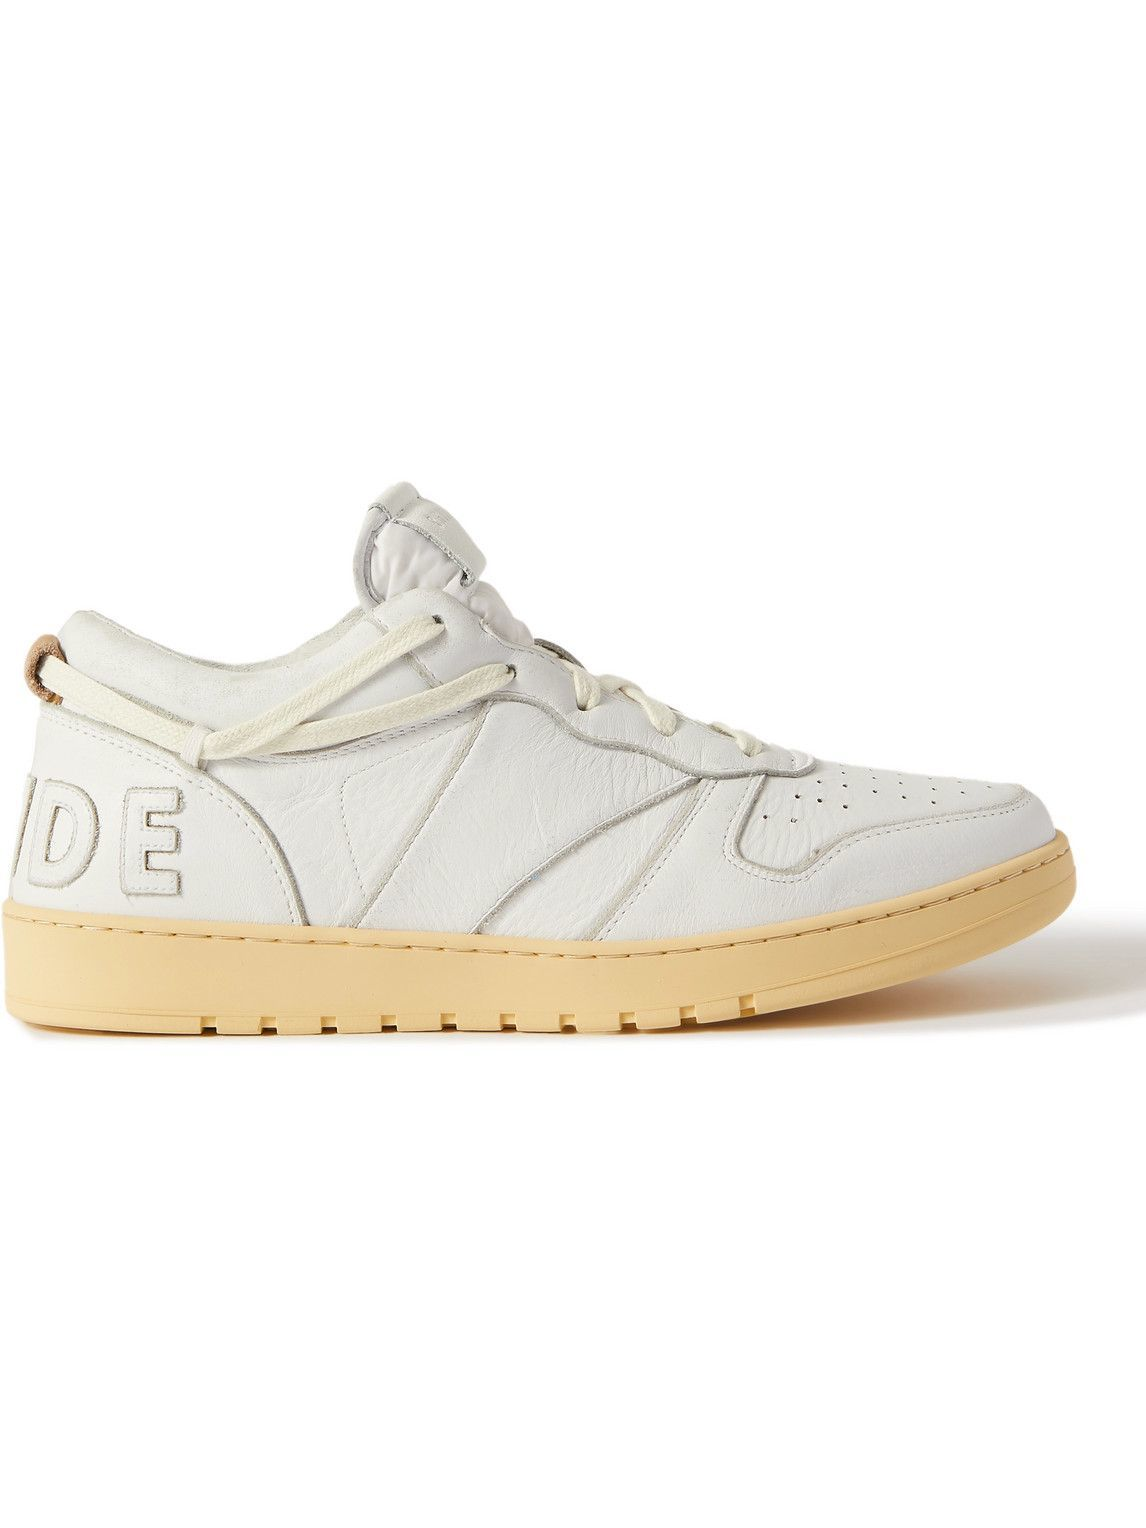 Photo: Rhude - Rhecess Logo-Appliquéd Distressed Leather Sneakers - White